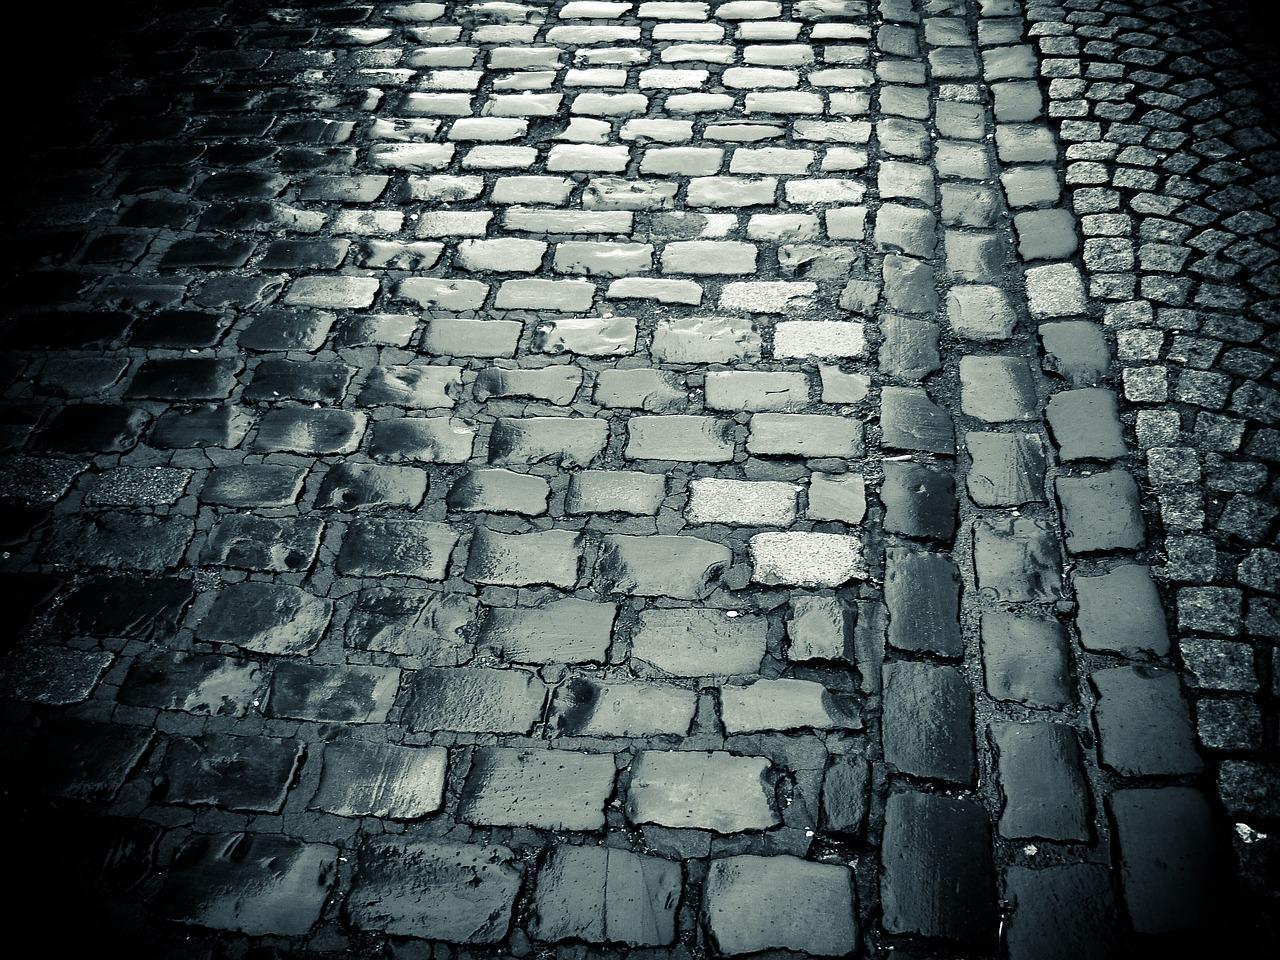 cobblestones-819087_1280